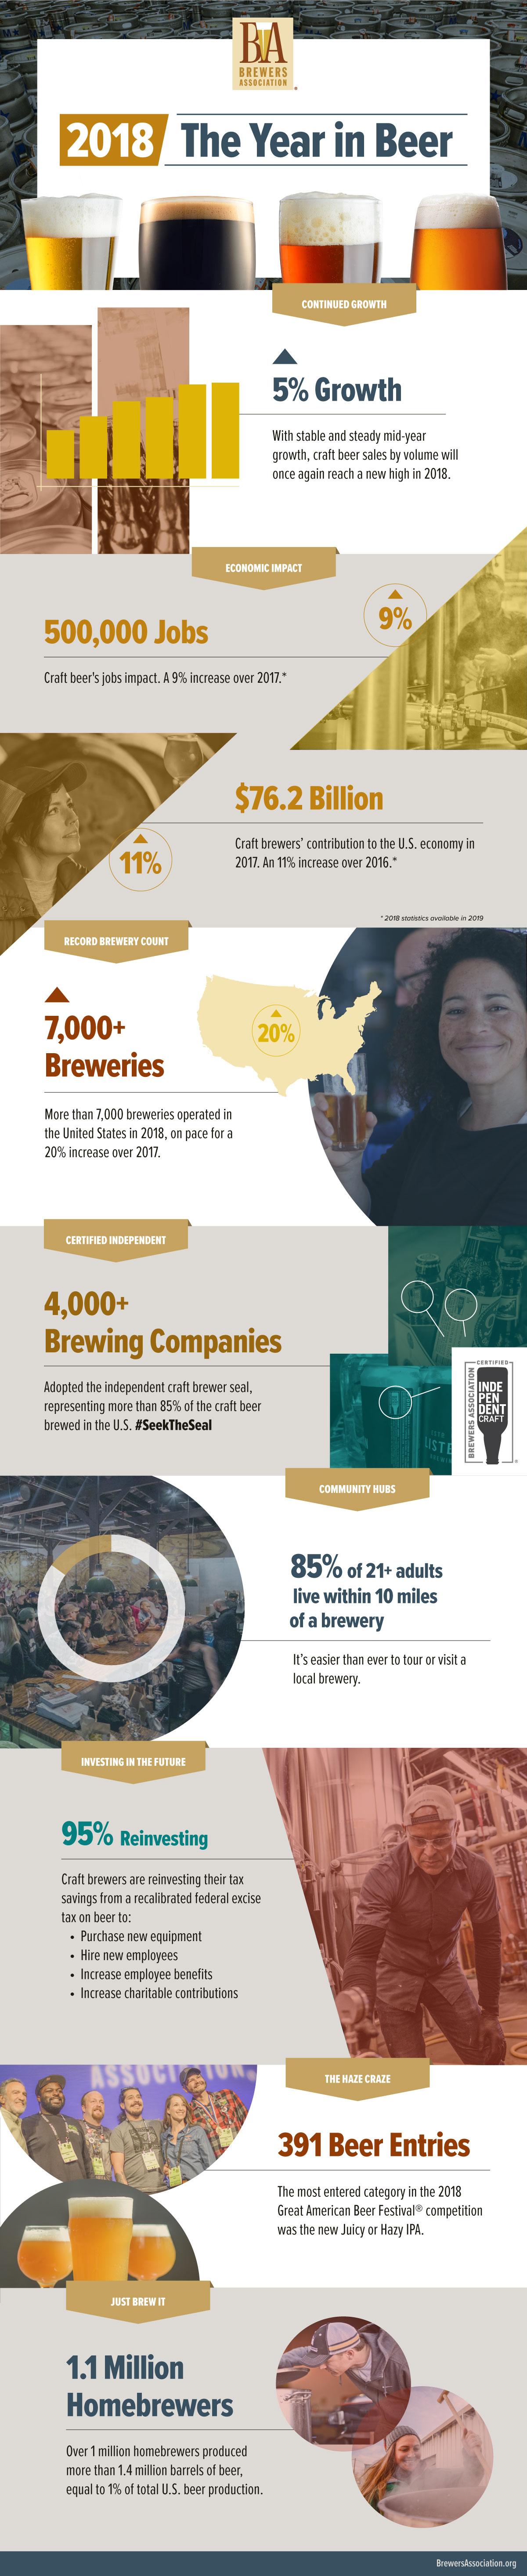 2018 Year in Beer